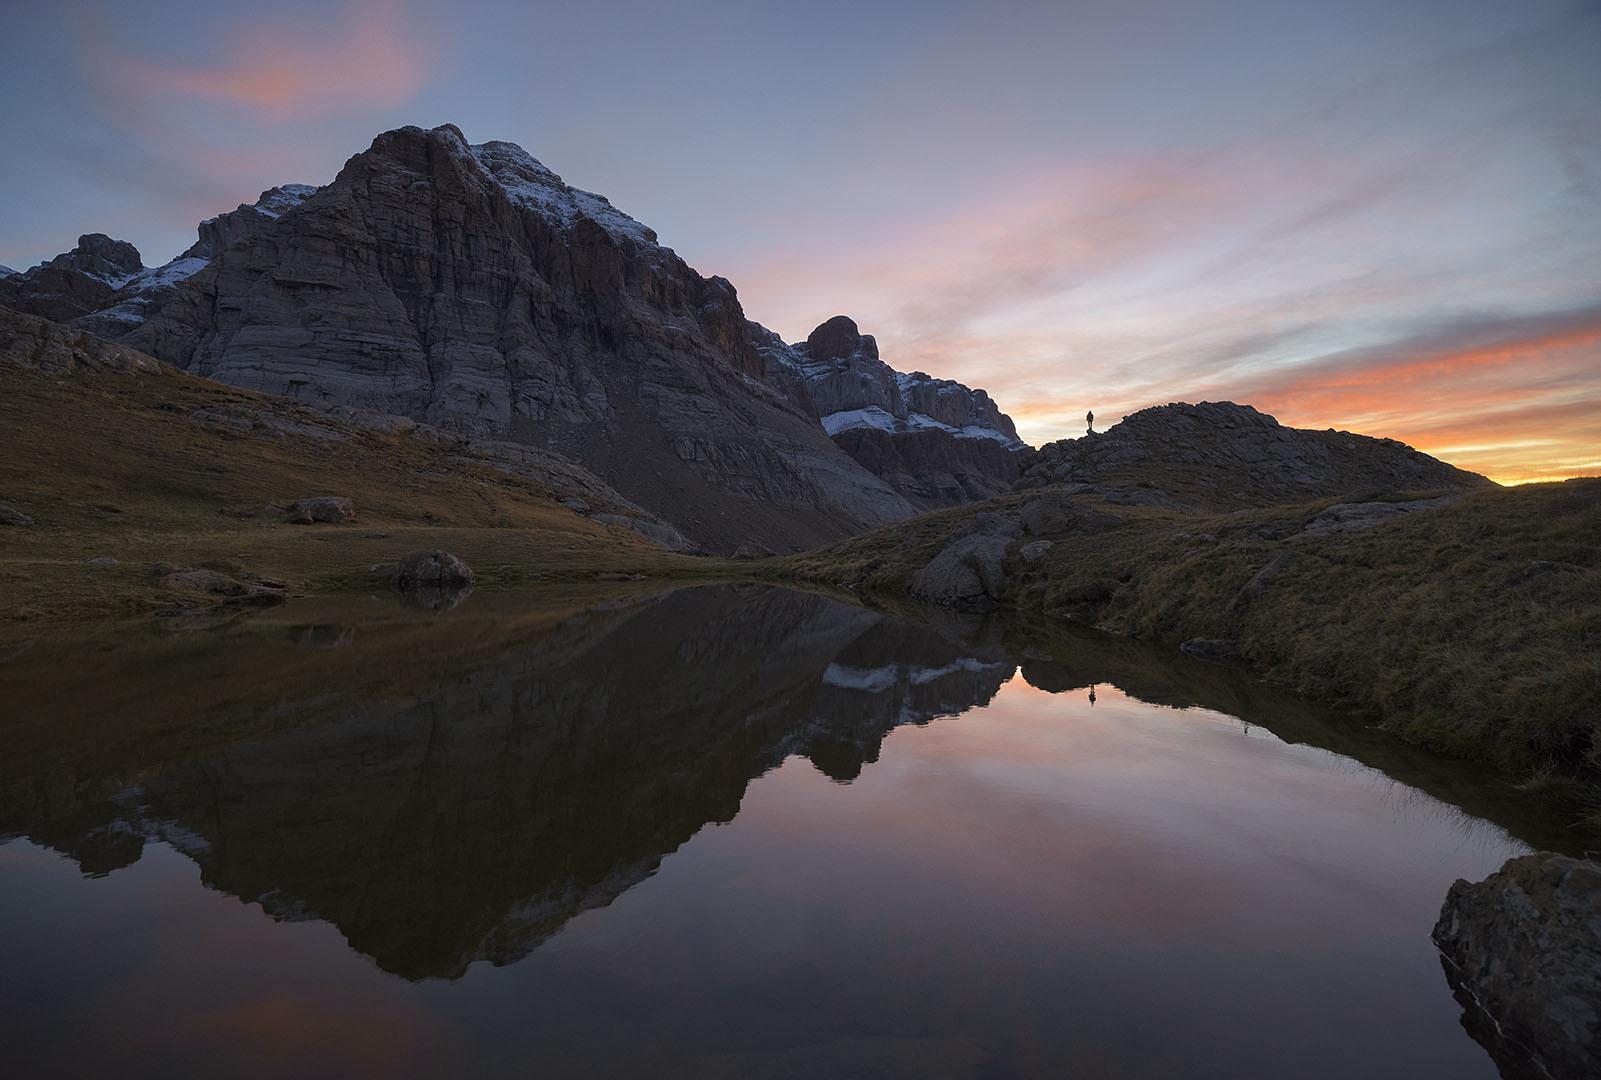 Reflejos al atardecer - Deportes y aventuras - Inaki Larrea, Nature and mountains Photography